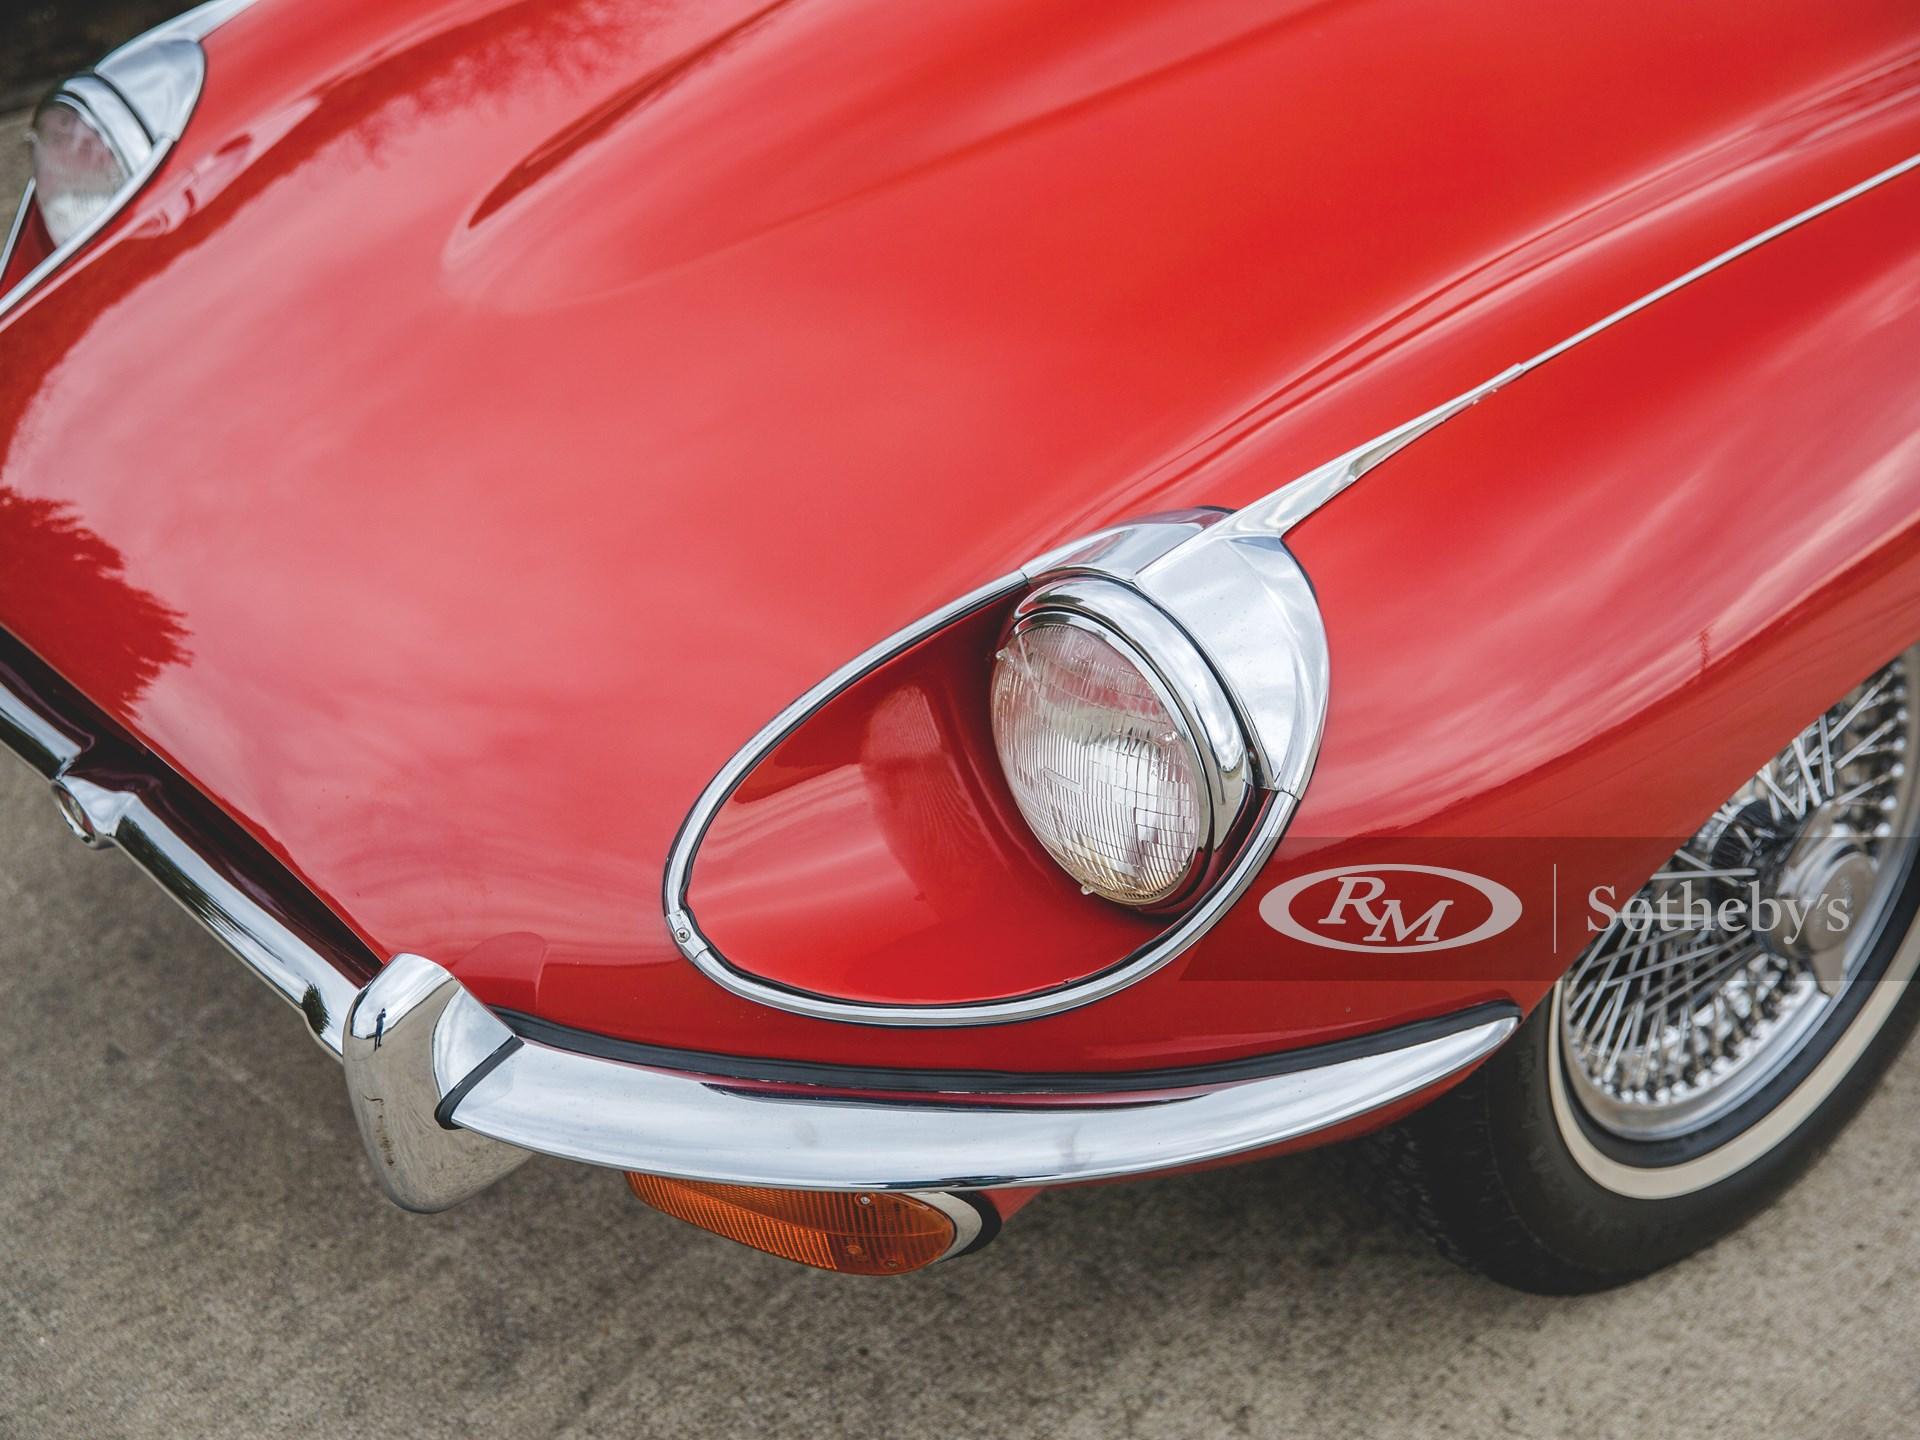 1970 Jaguar E-Type Series 2 4.2-Litre Fixed Head Coupe  -